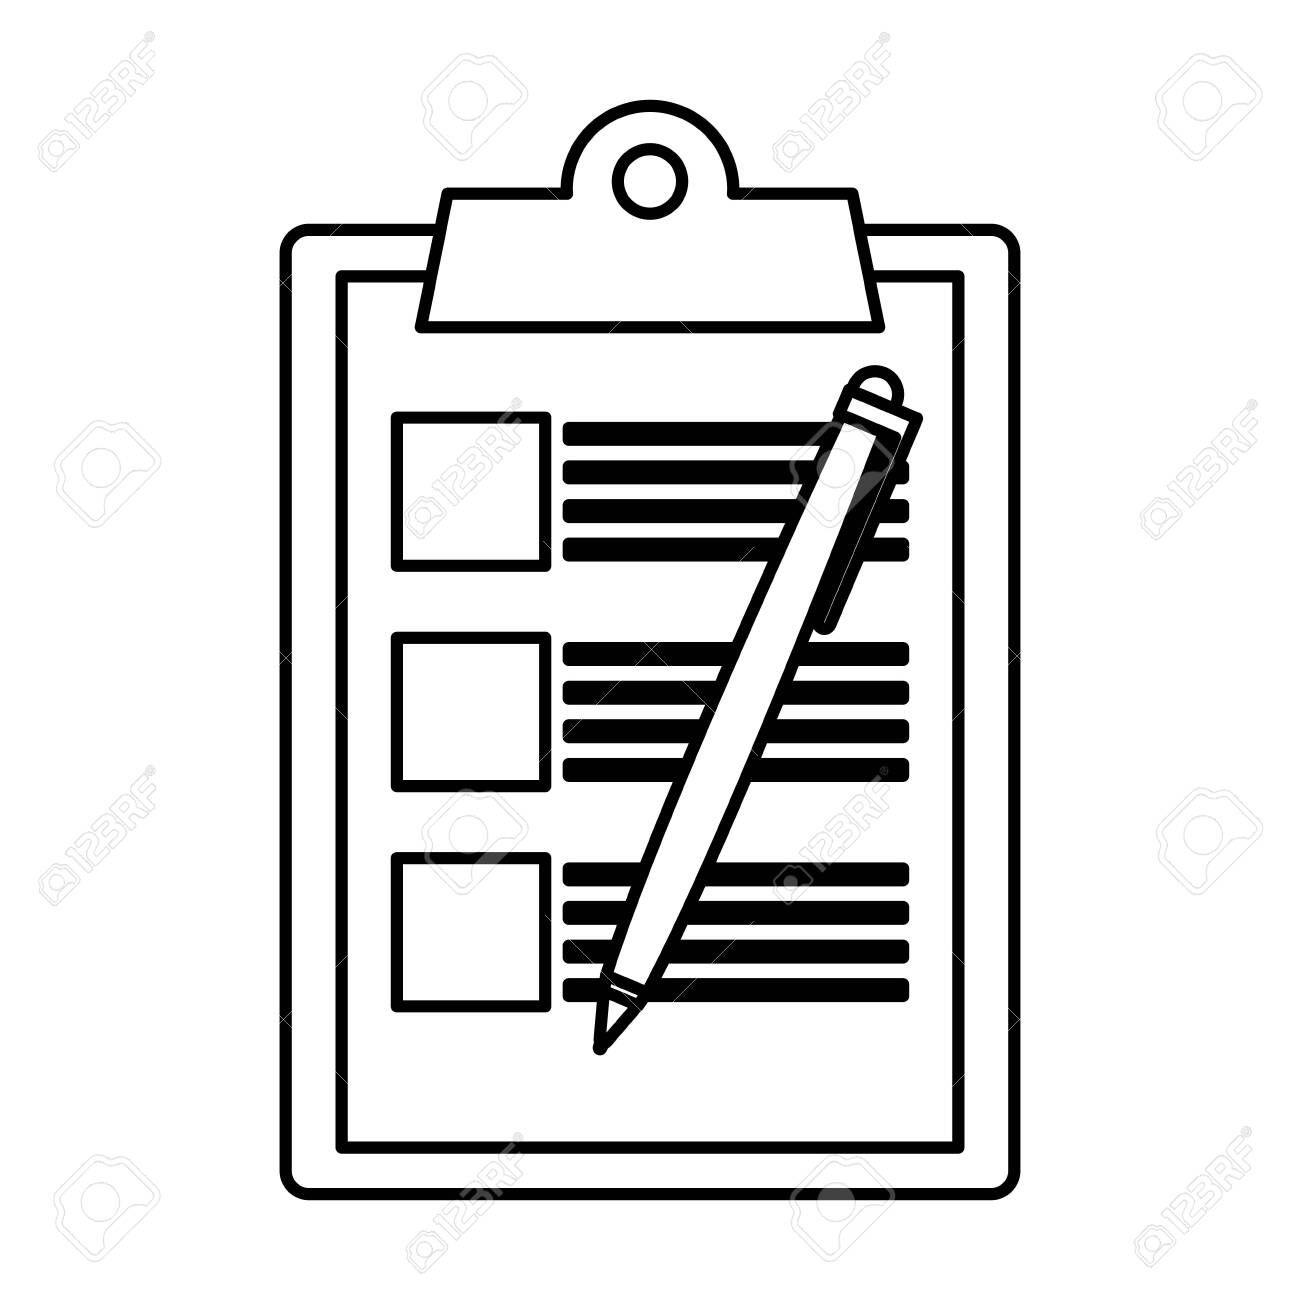 Checklist Clipboard With Pen Vector Illustration Design